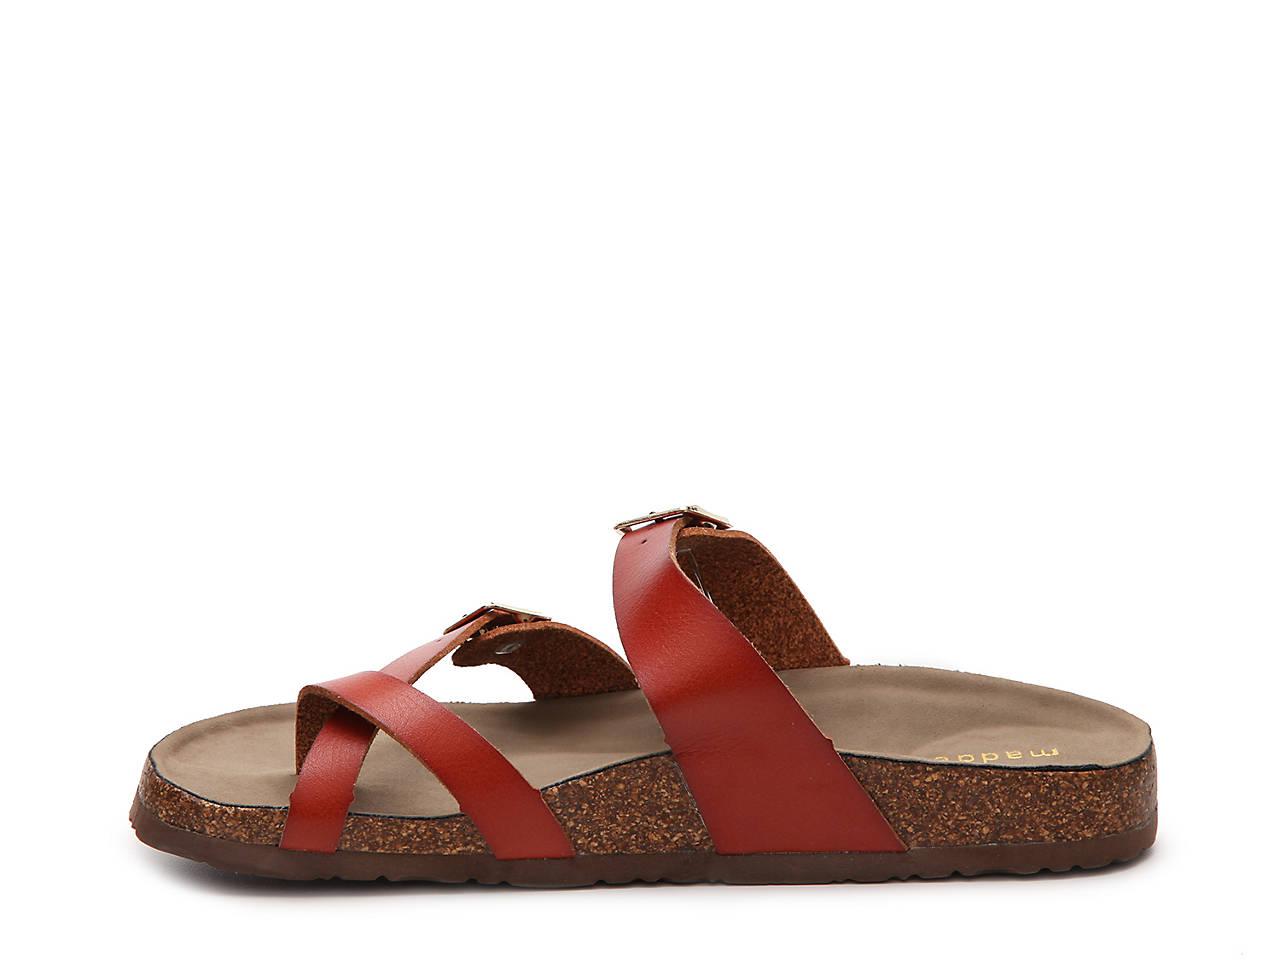 d7c4fbd537c Madden Girl Bryceee Sandal Women s Shoes